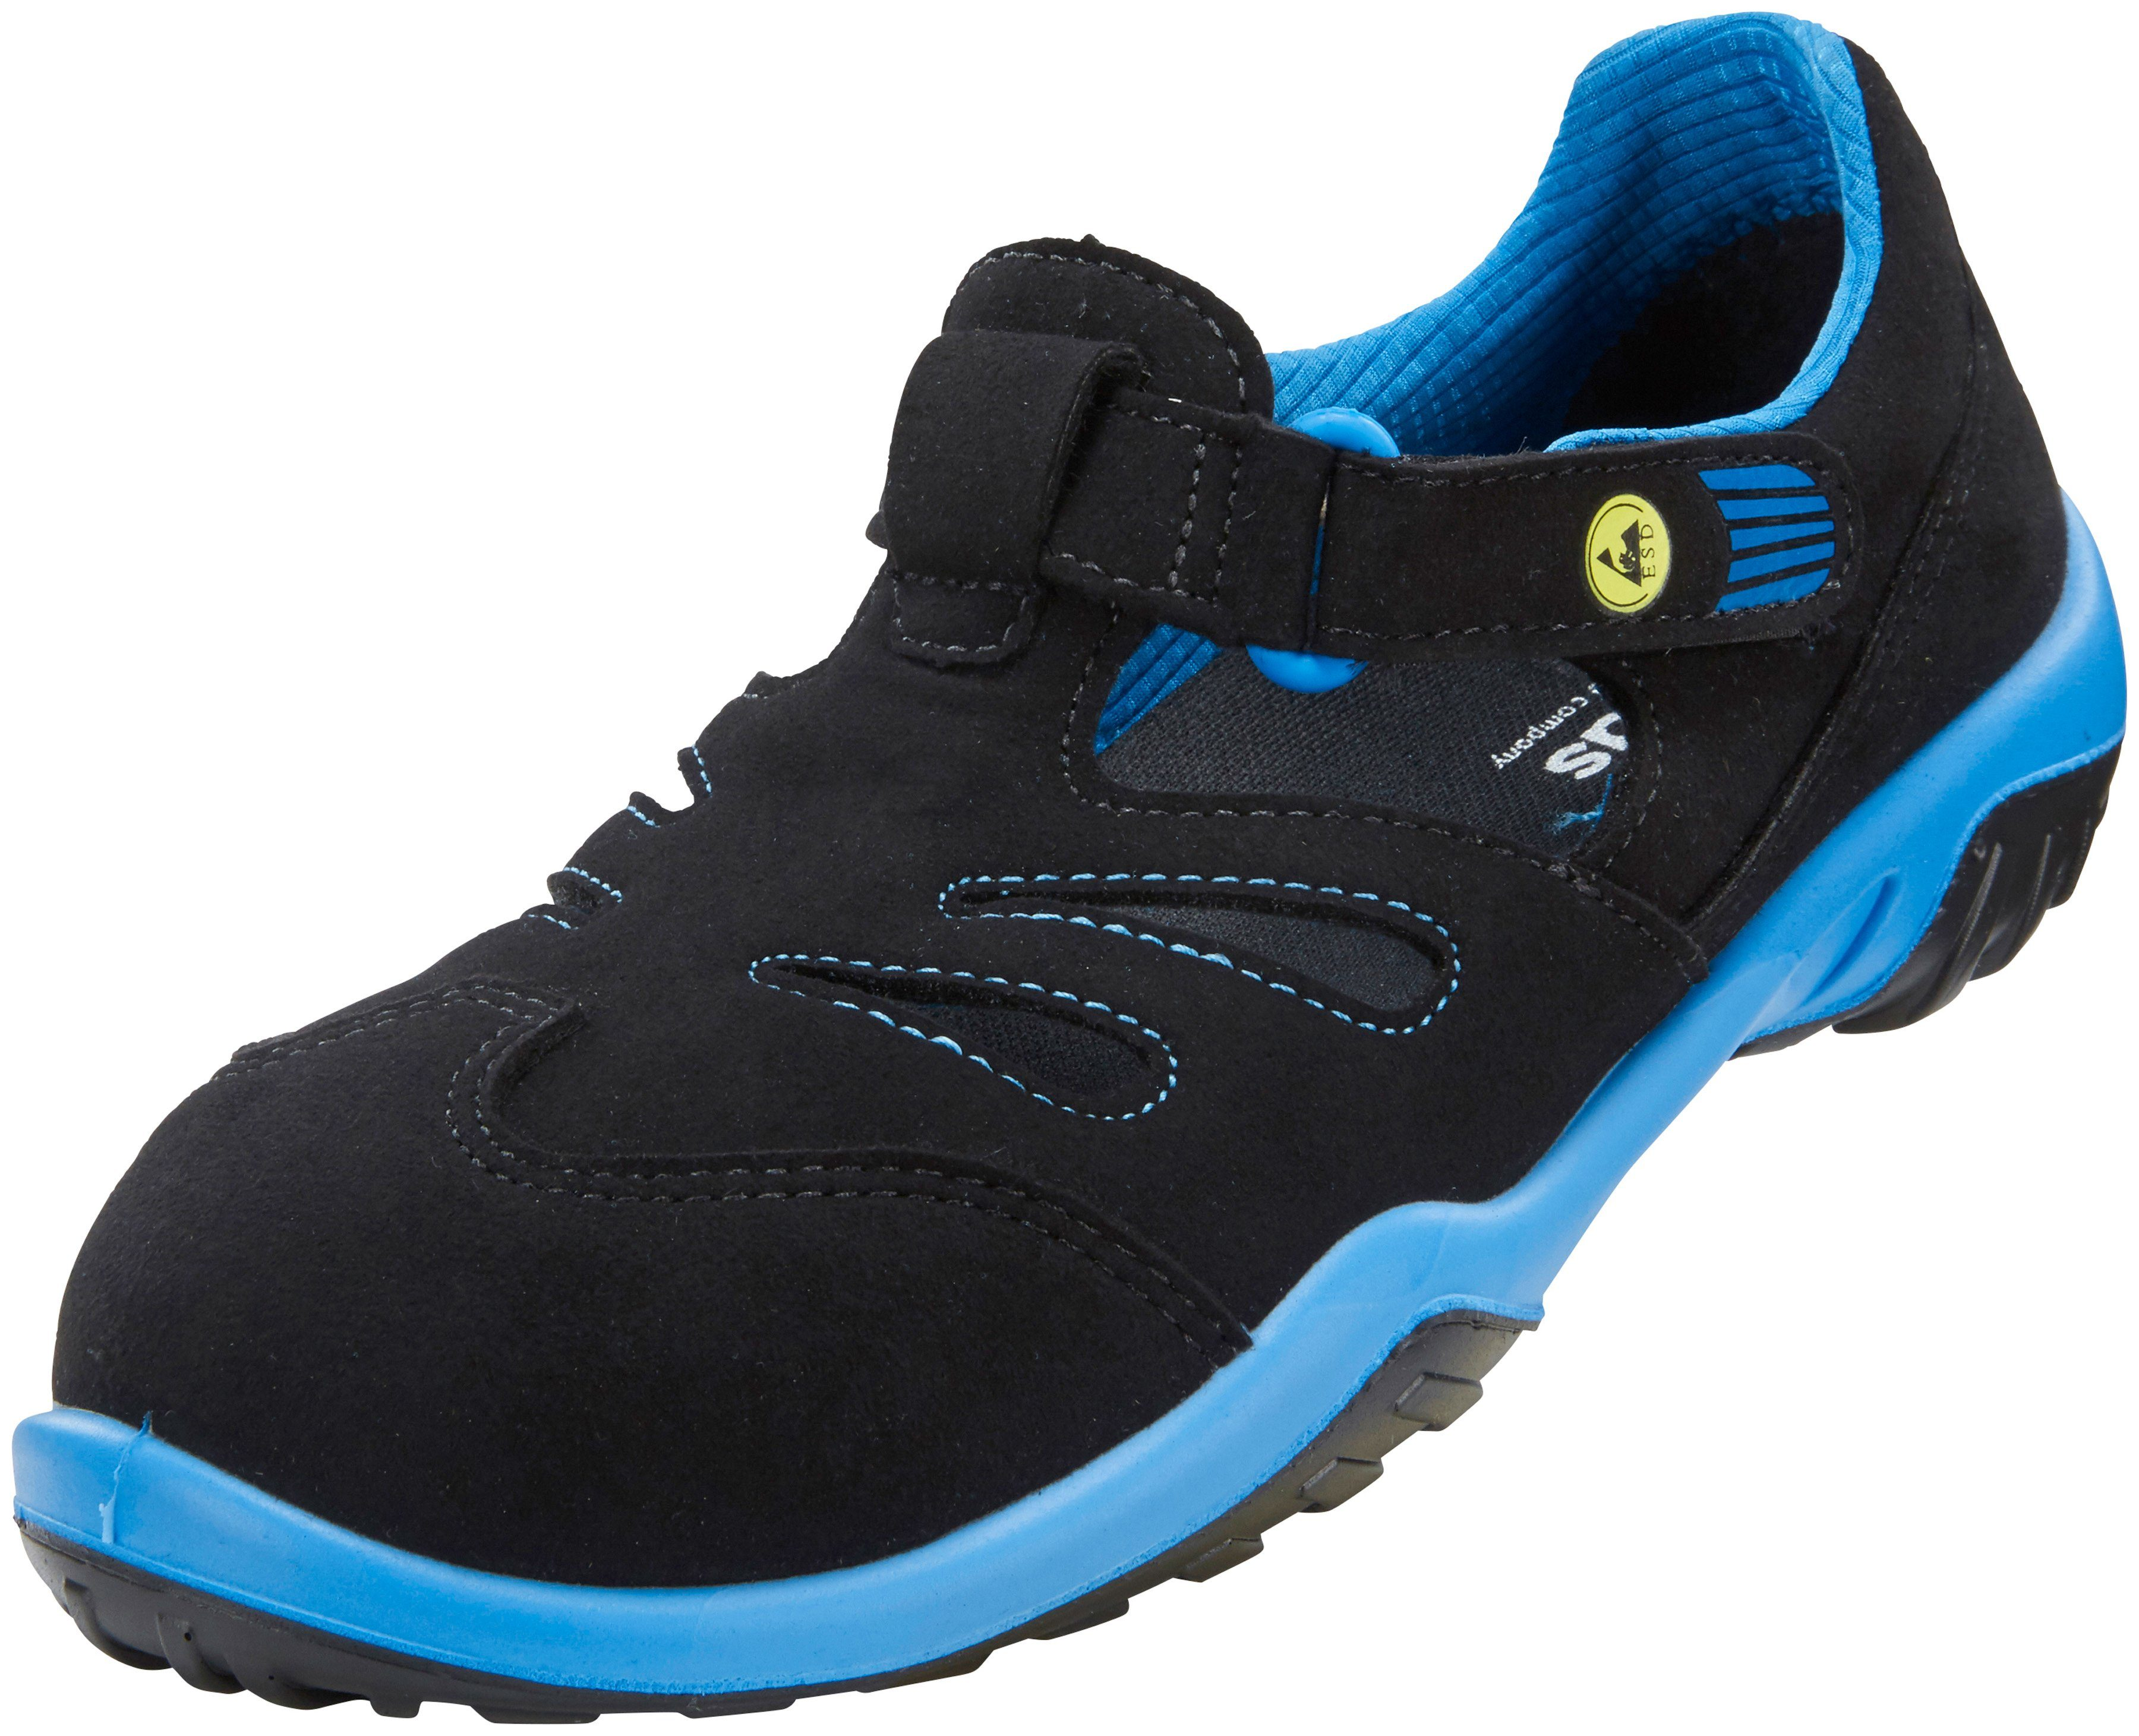 Atlas Schuhe Atlas Damen-Sicherheitssandale »GX 350 black«, schwarz, schwarz/blau